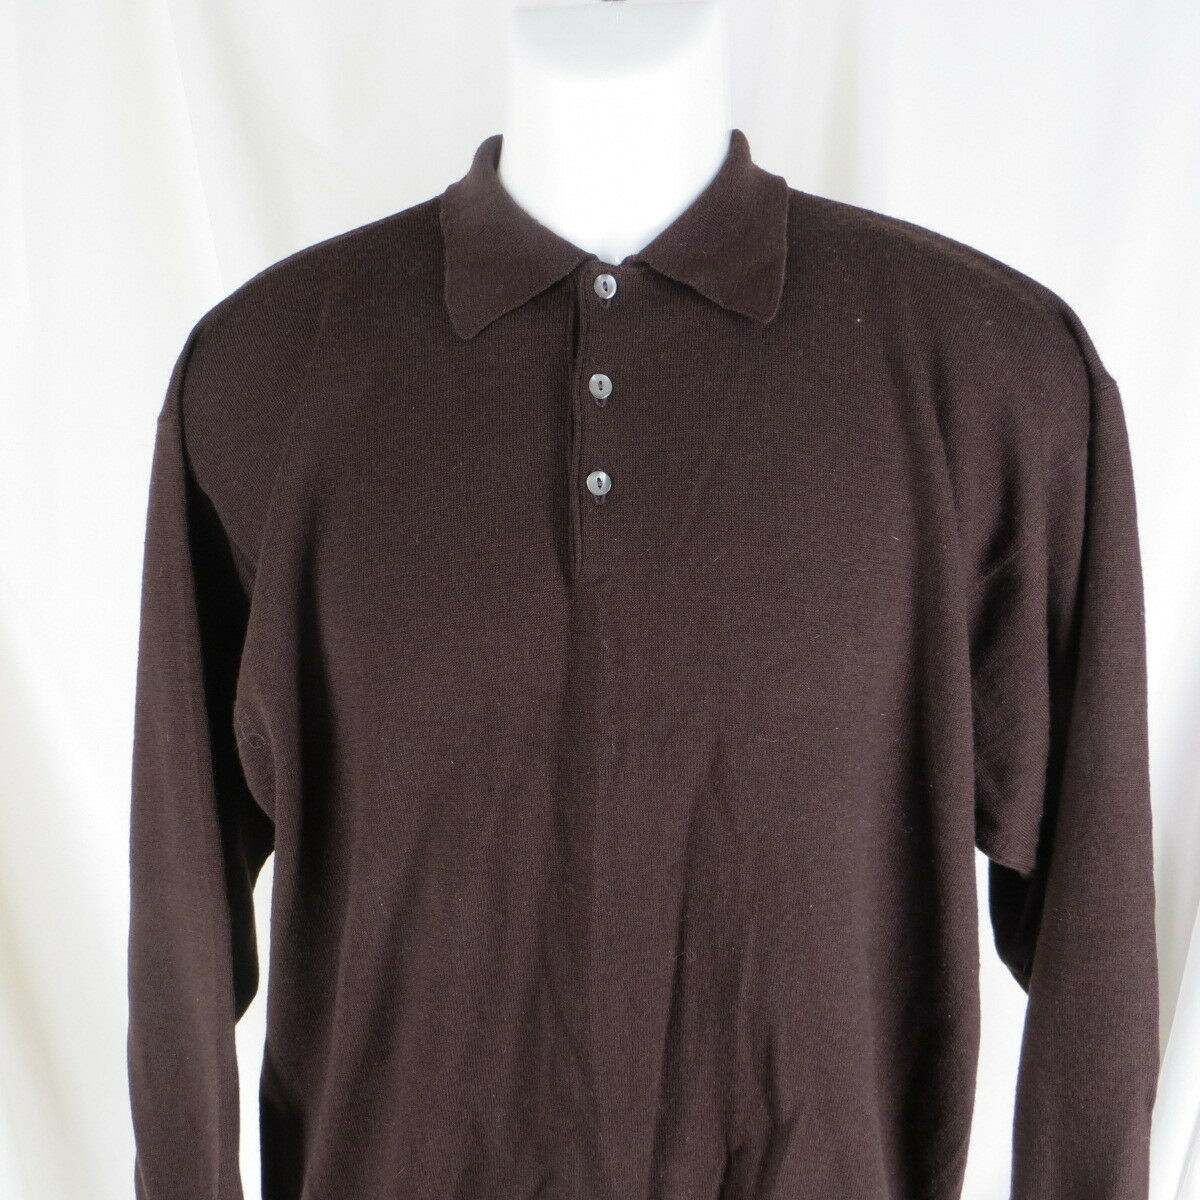 Vintage L Merino Sweater Neiman Marcus Made in Scotland Polo Collar Dark Braun